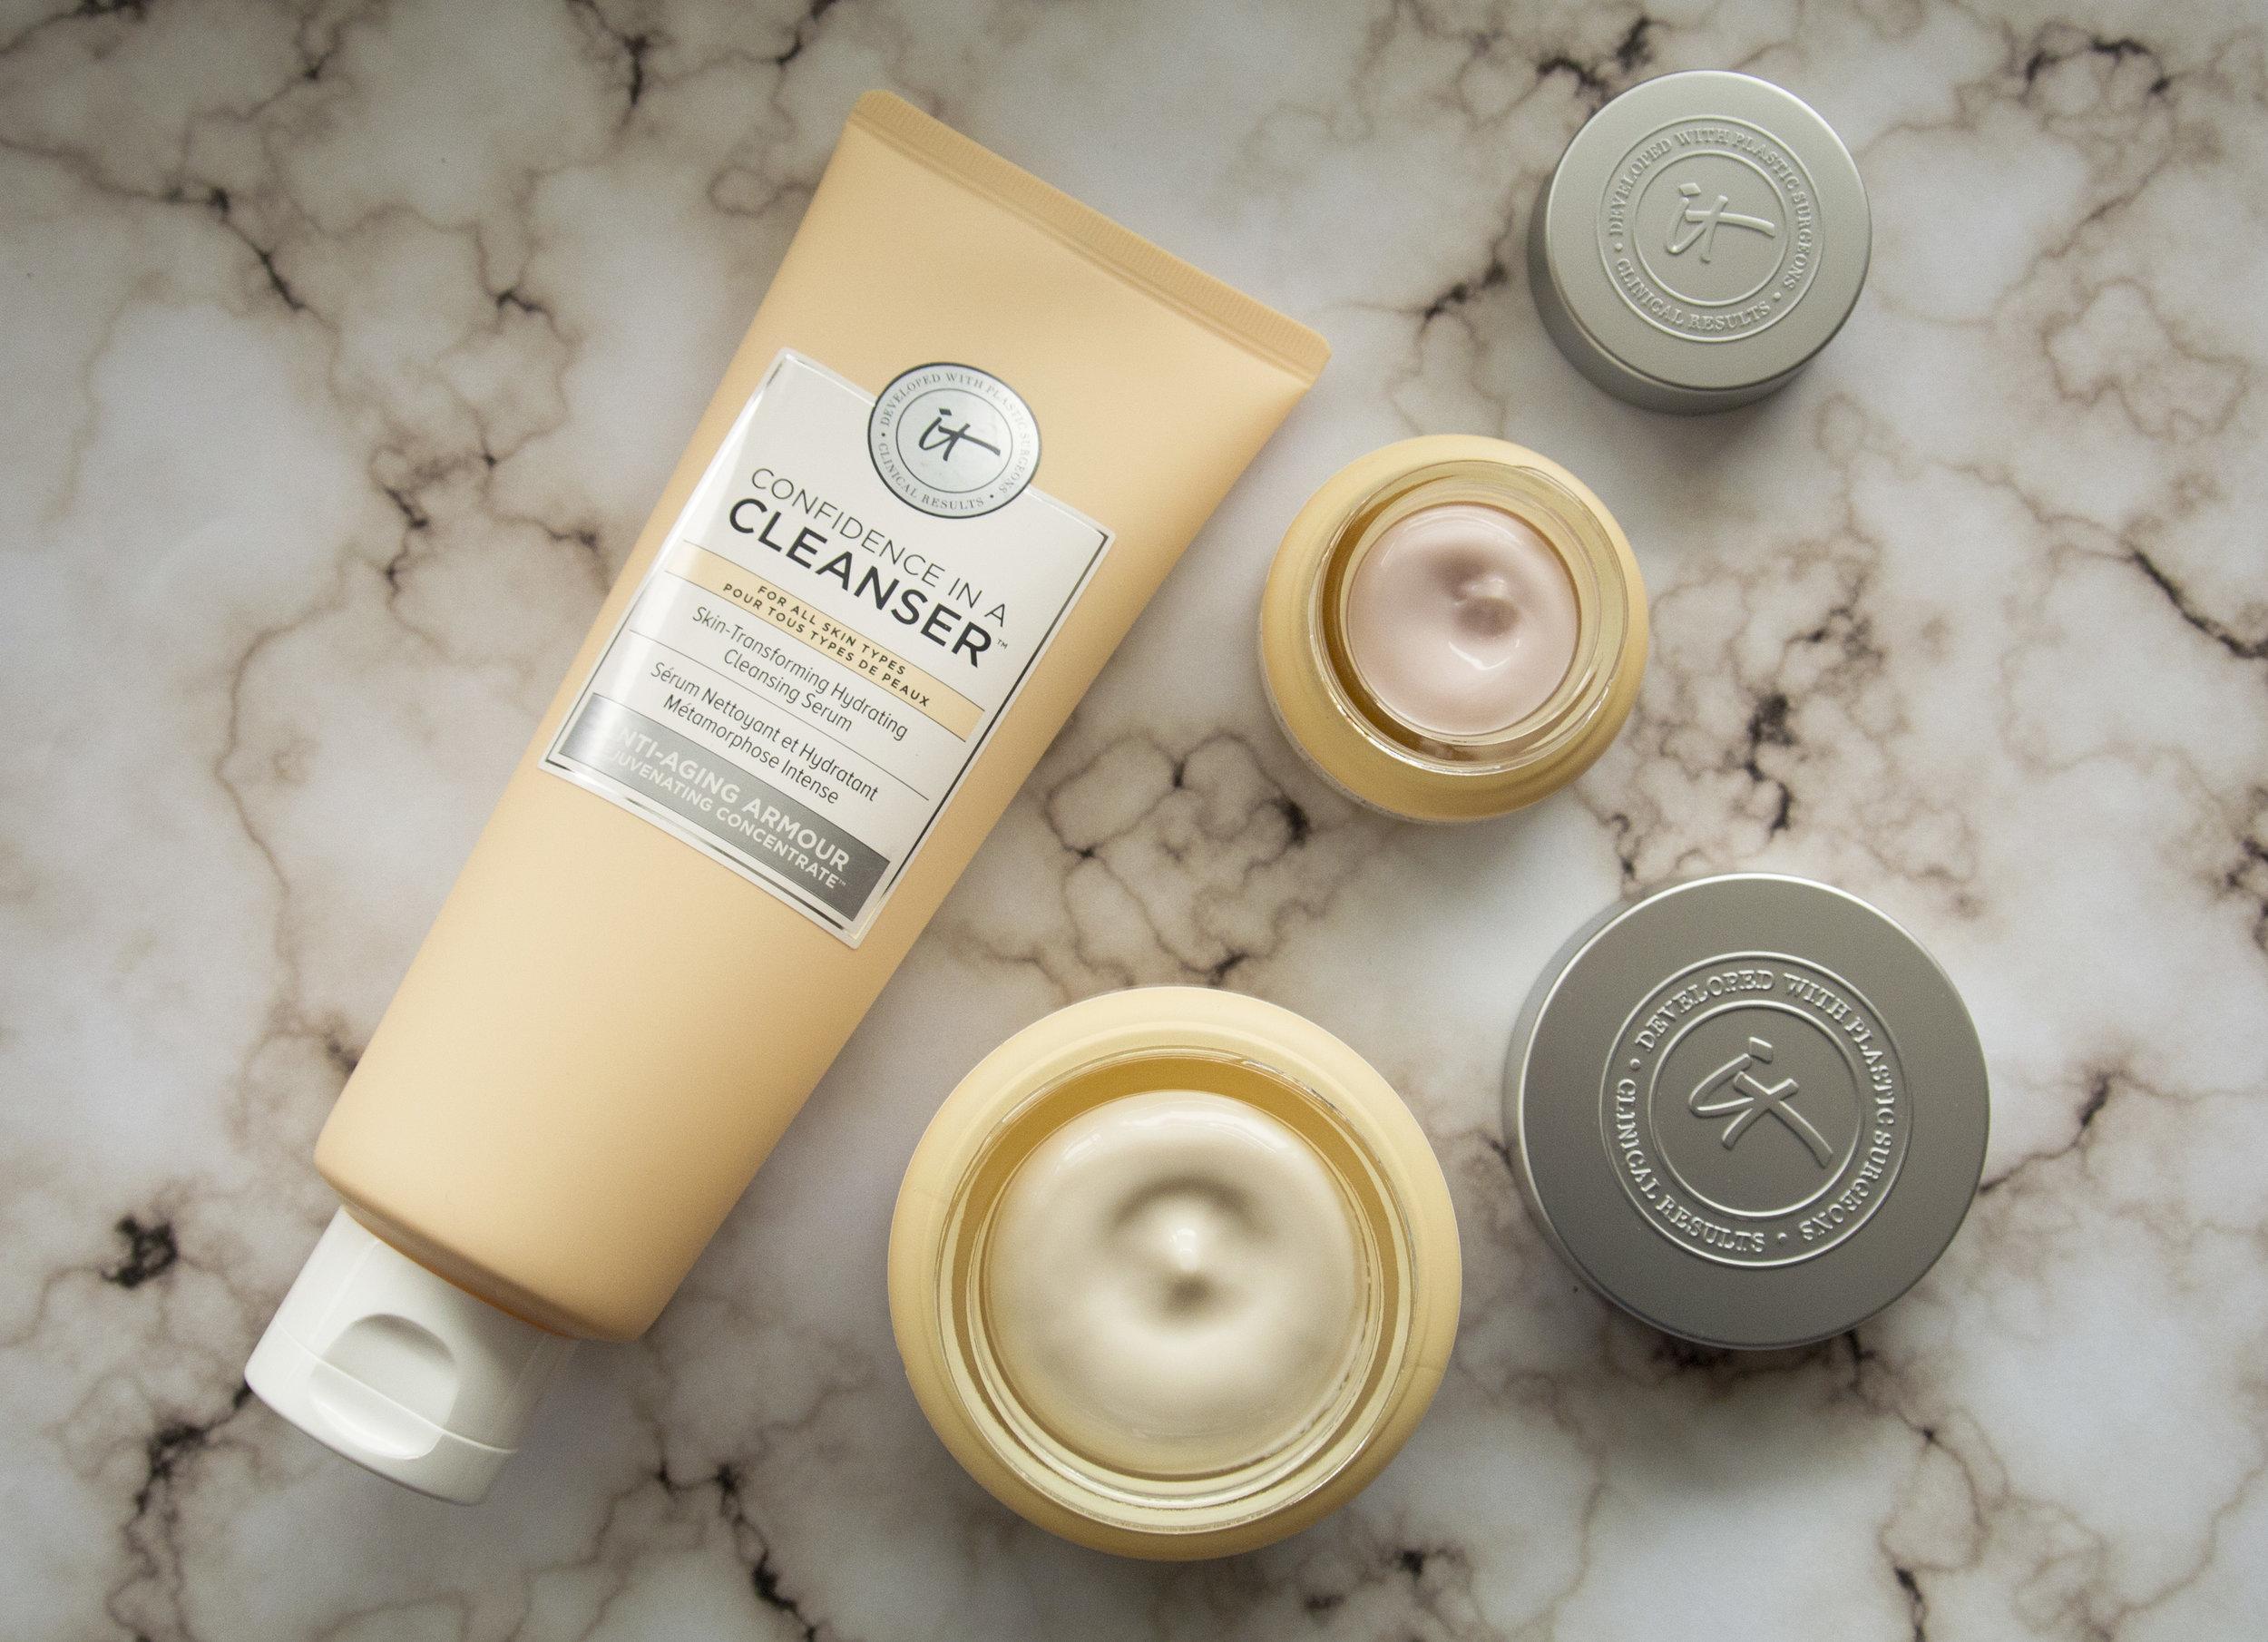 It-Cosmetics-Confidence-Skincare-Swirl.jpg